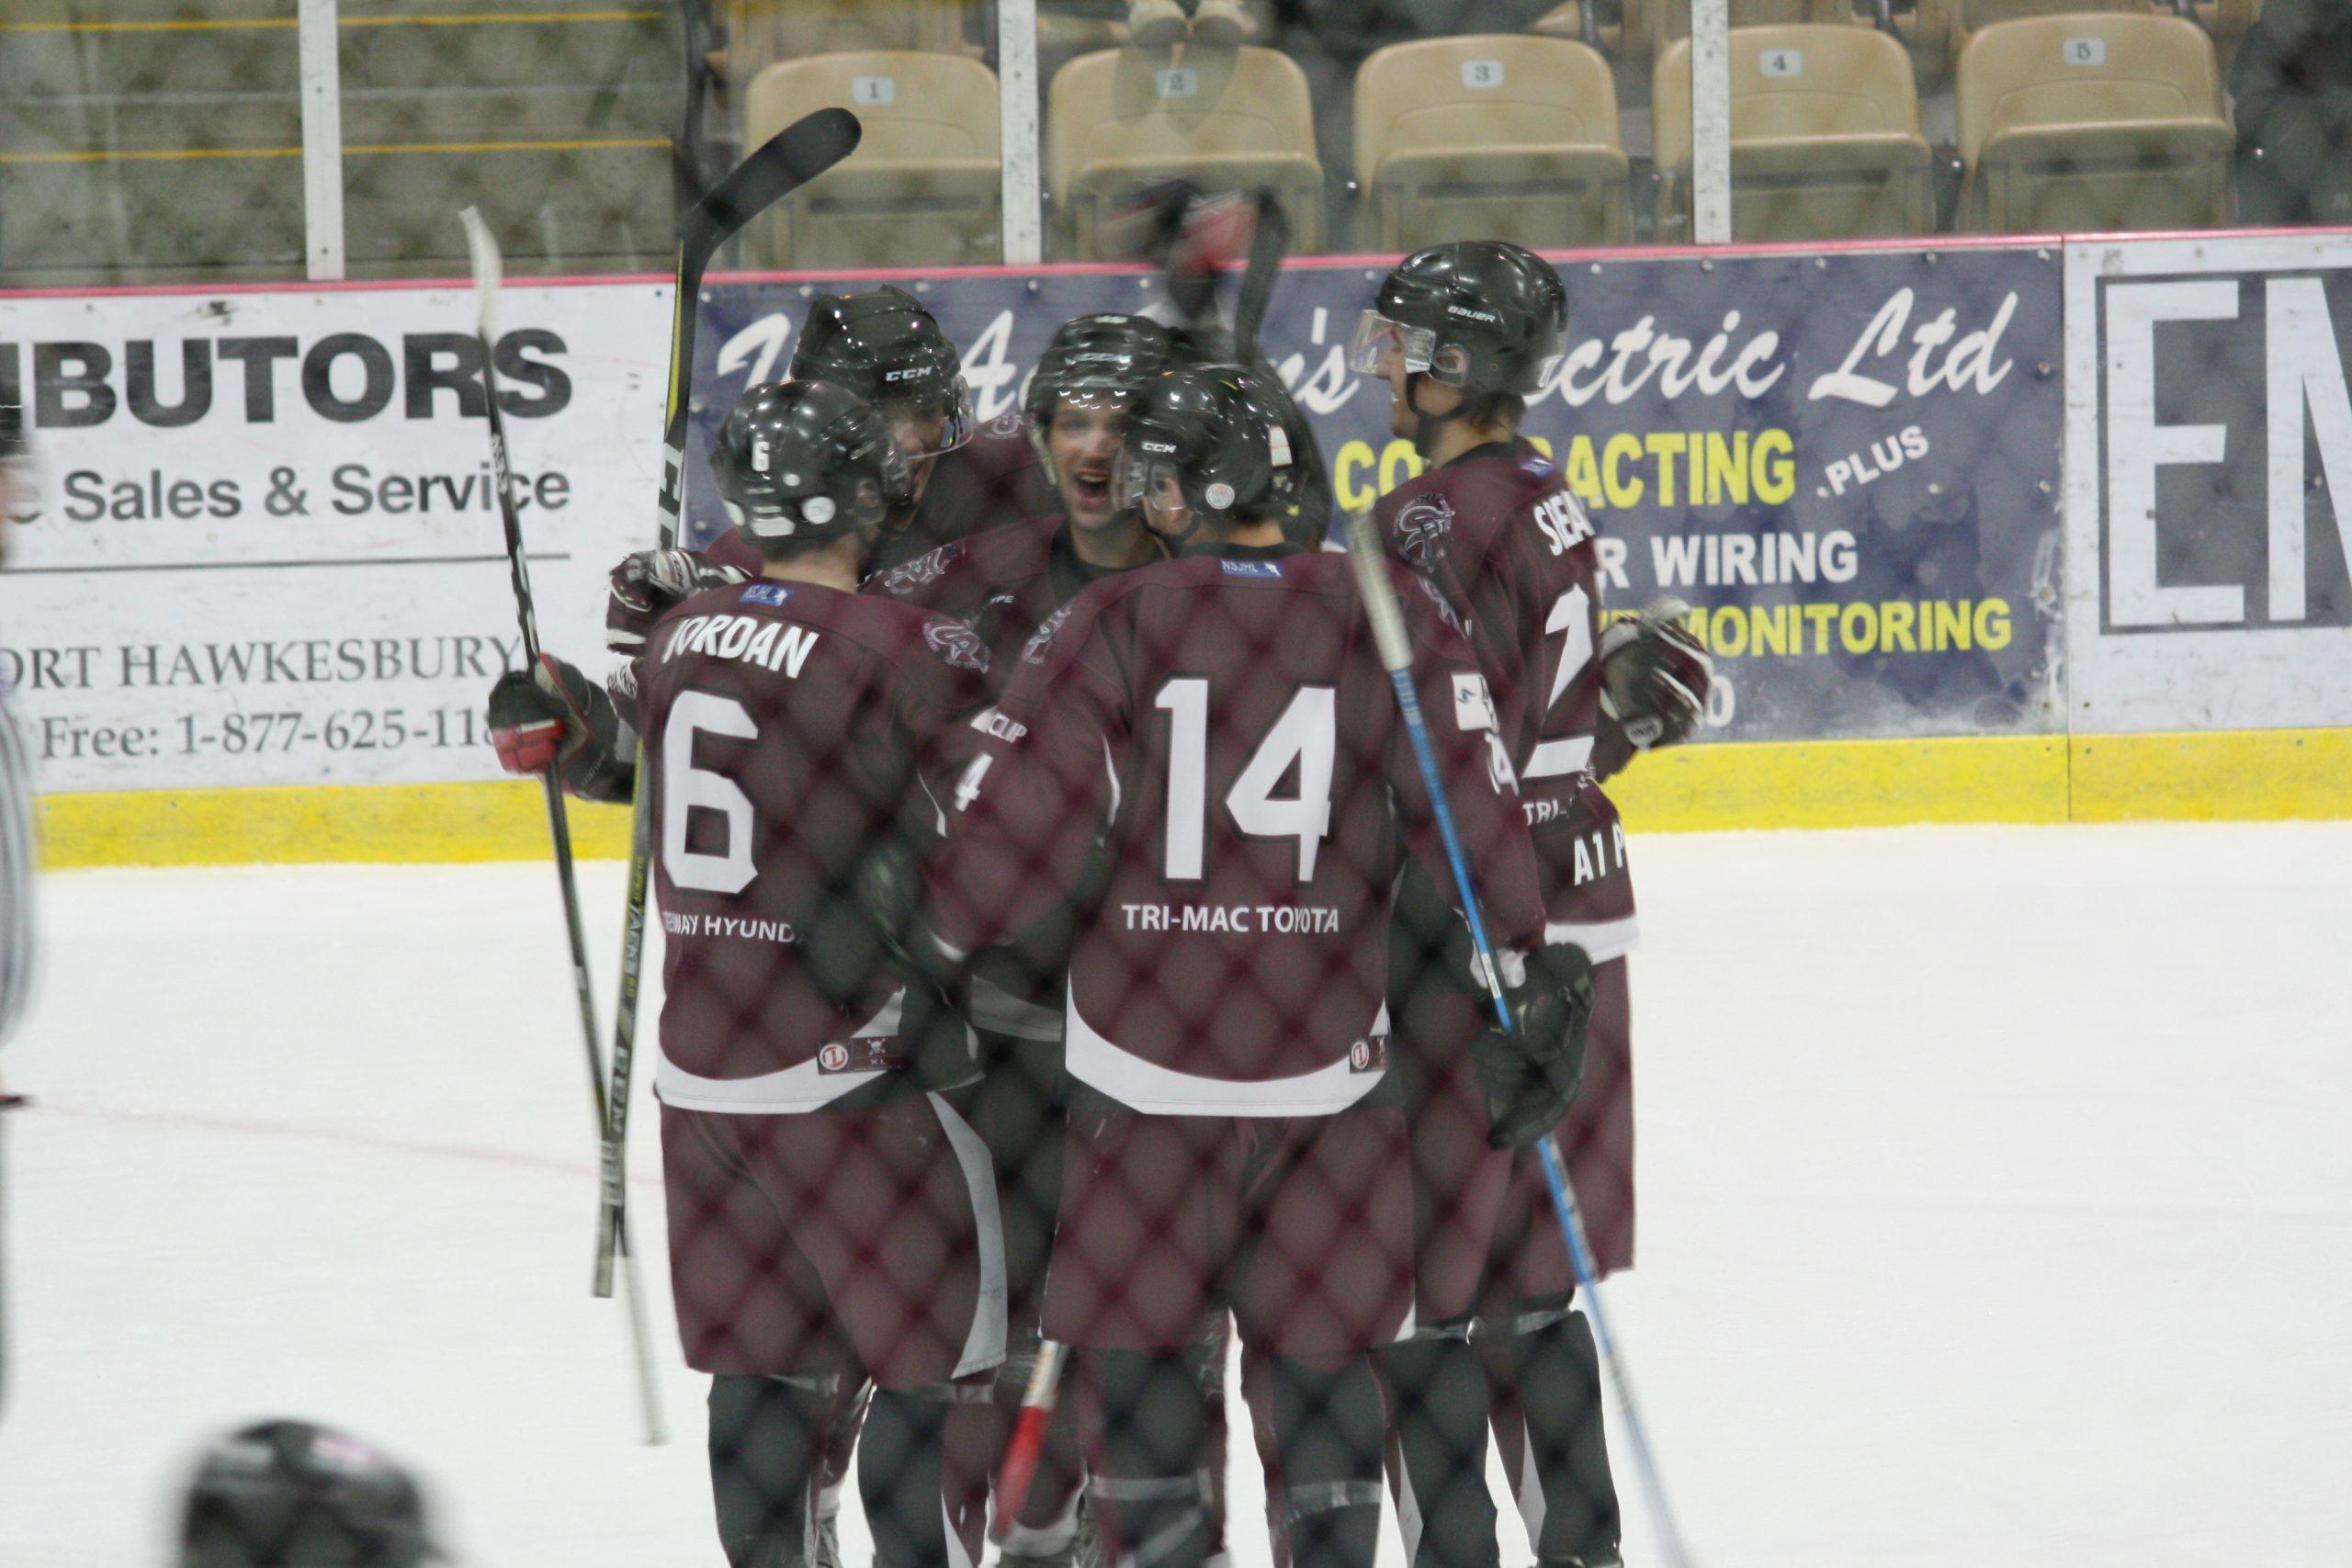 Nova Scotia Junior Hockey League result (from Port Hawkesbury Friday)